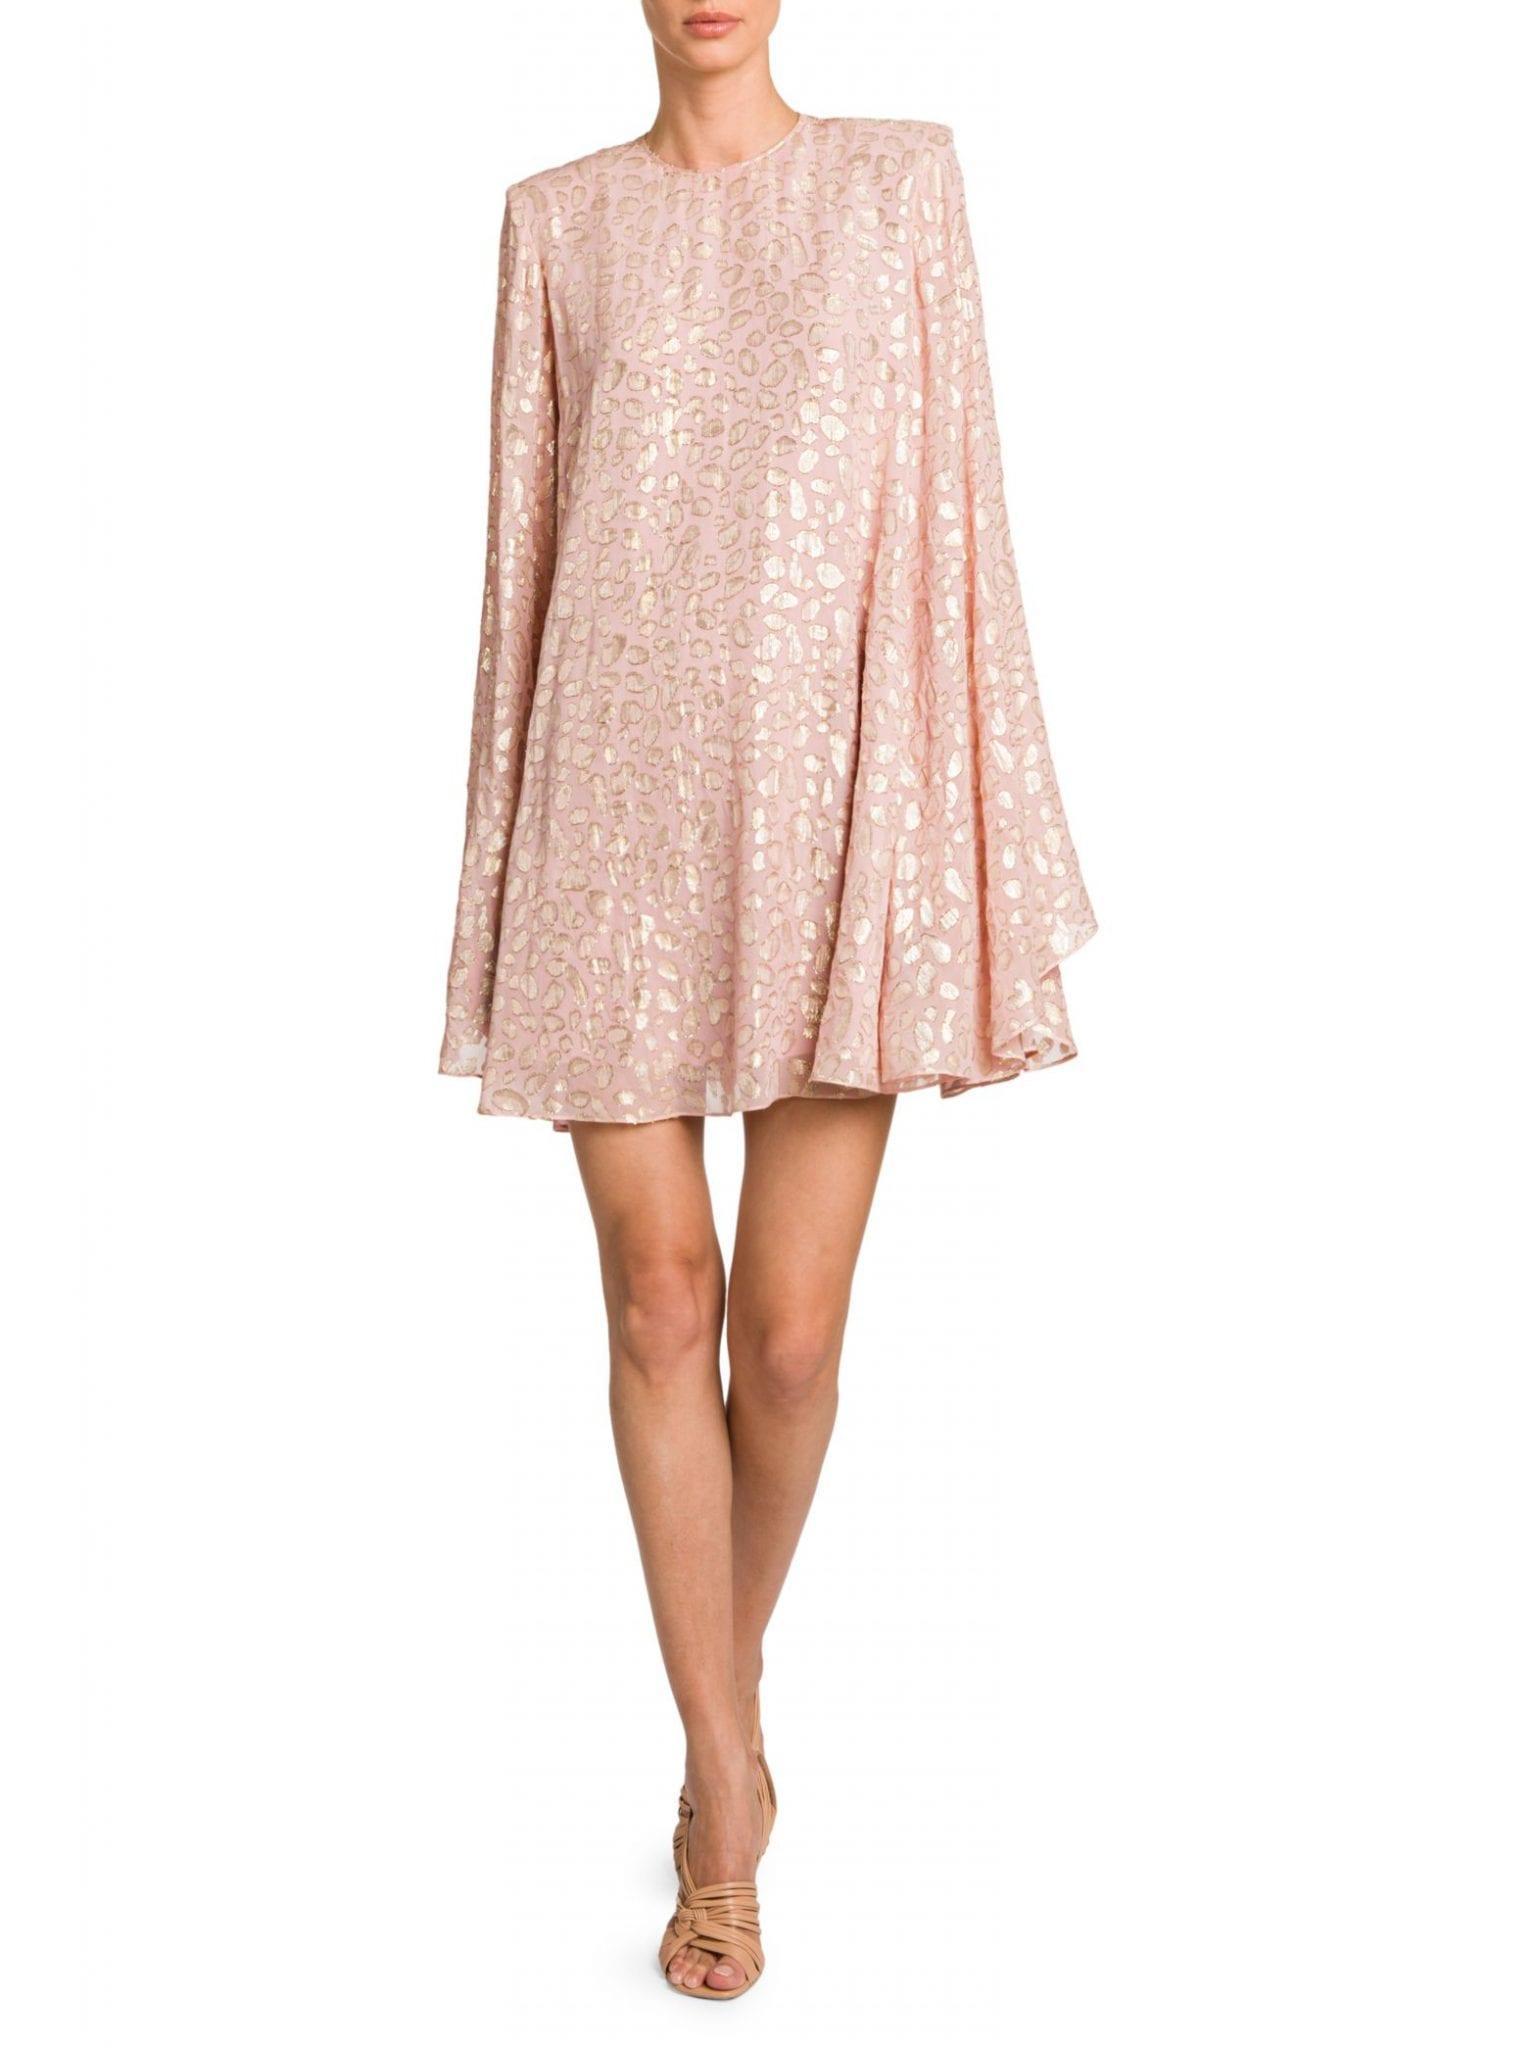 STELLA MCCARTNEY Leopard-Print Babydoll Dress